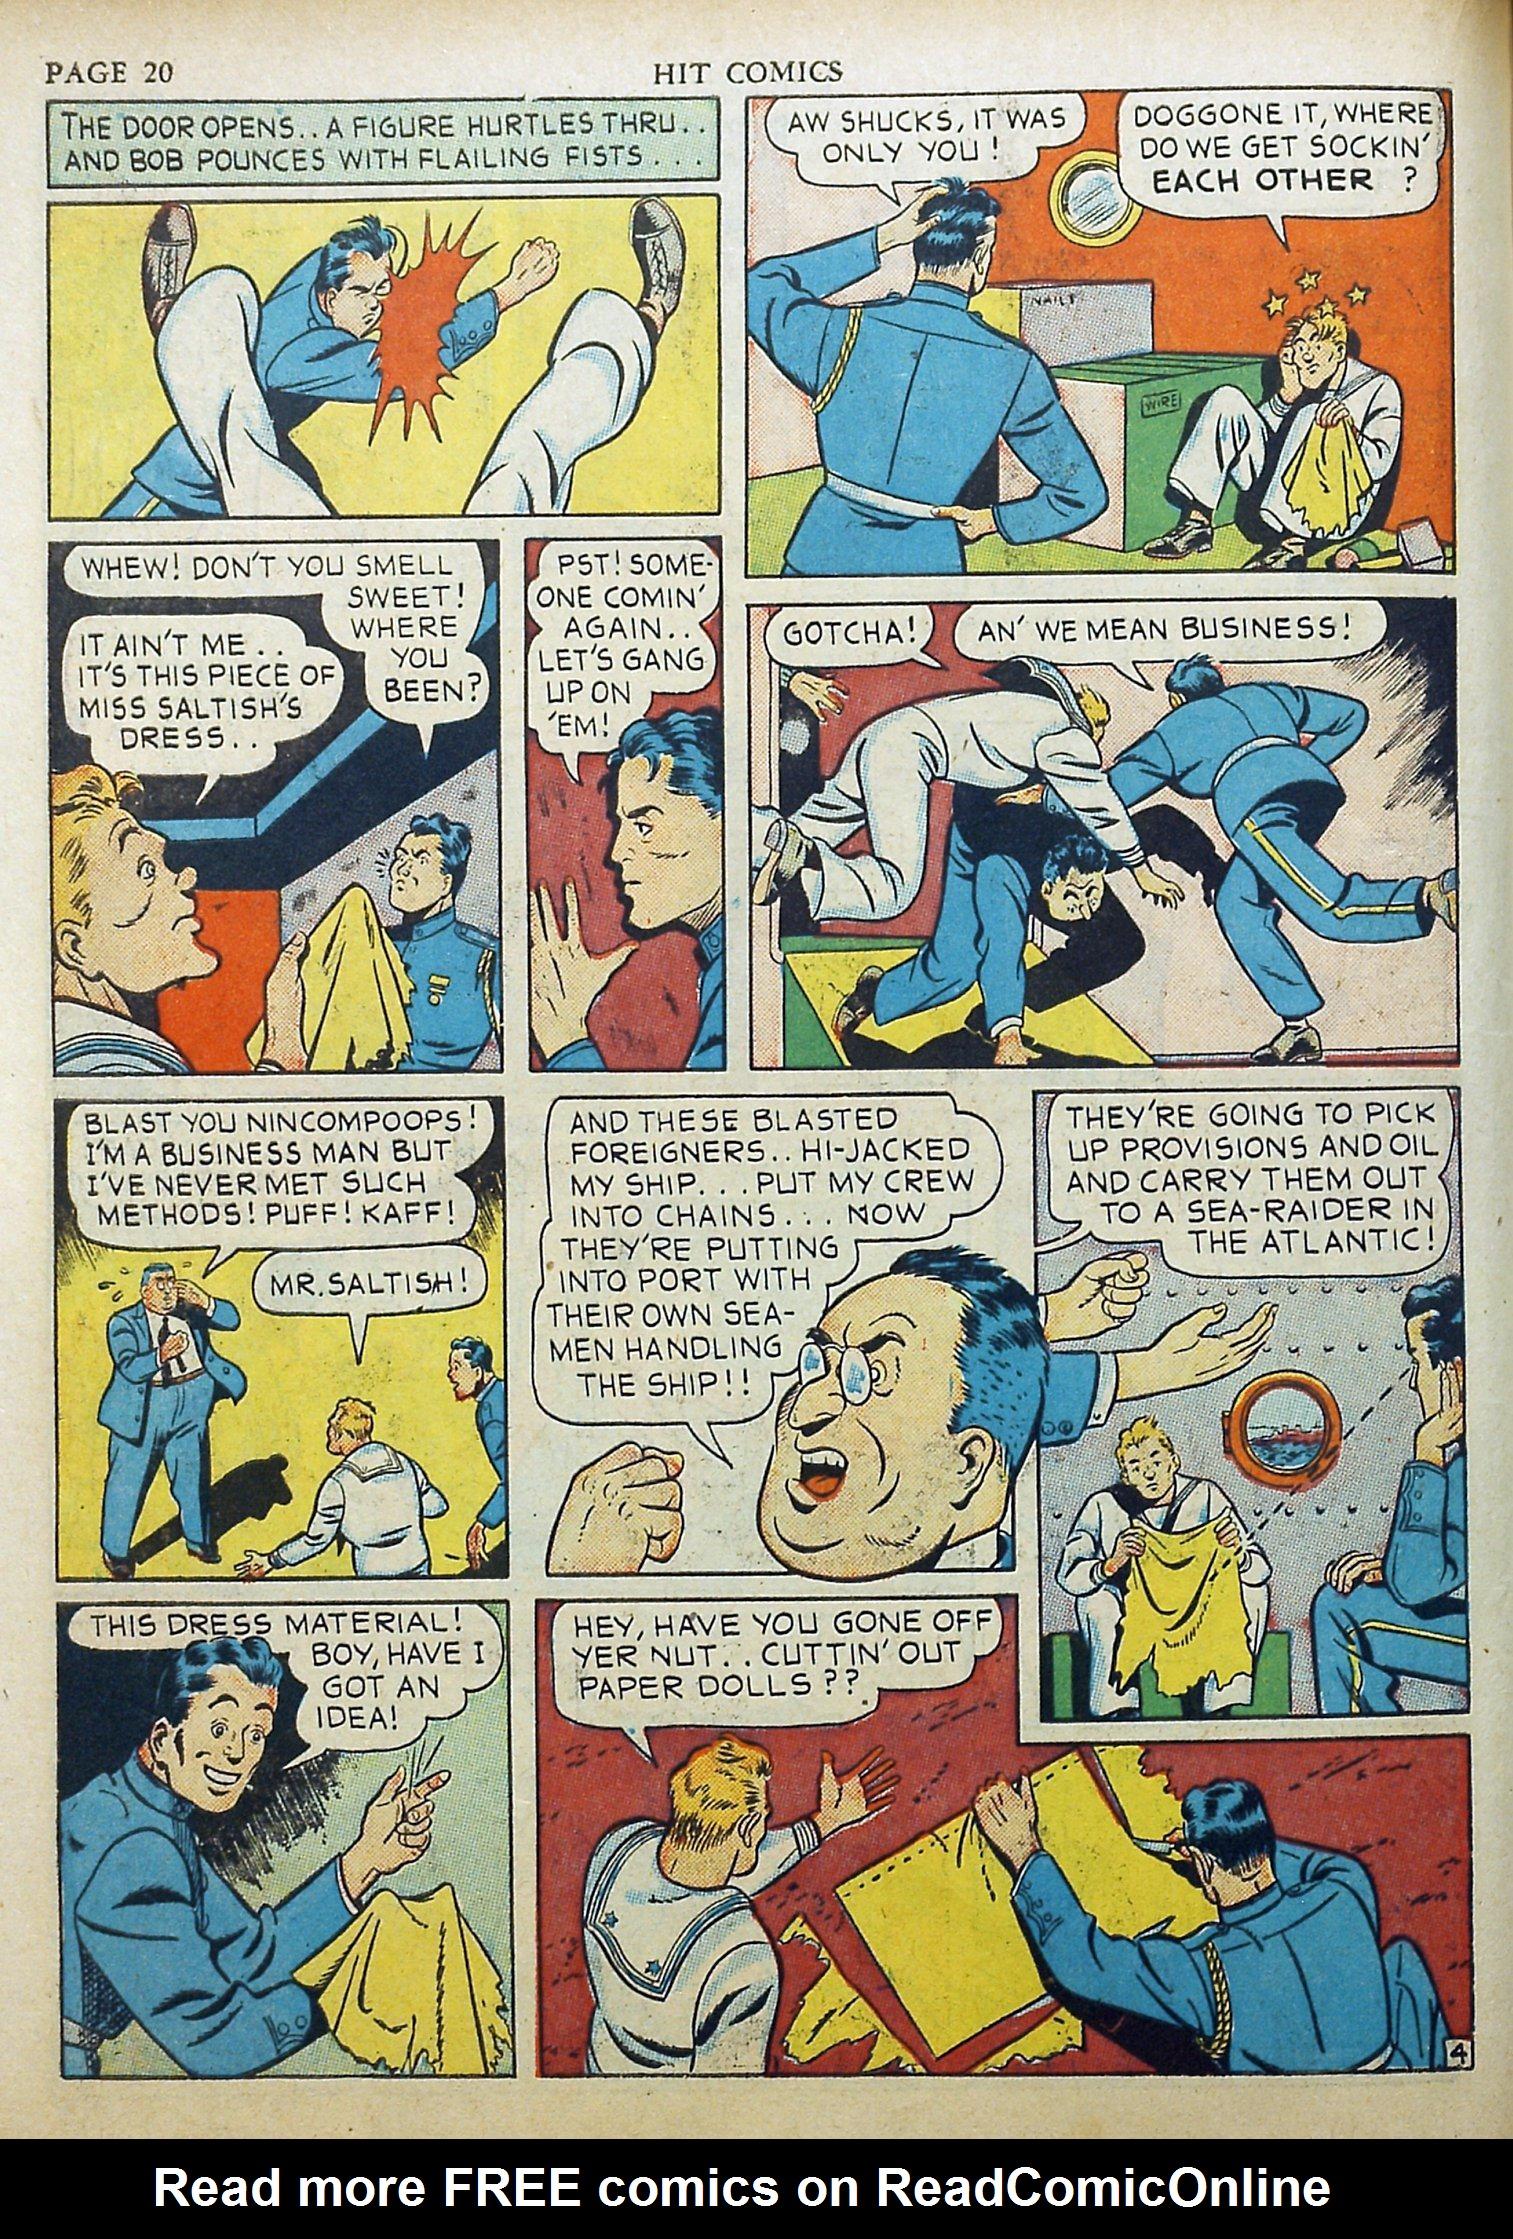 Read online Hit Comics comic -  Issue #17 - 22